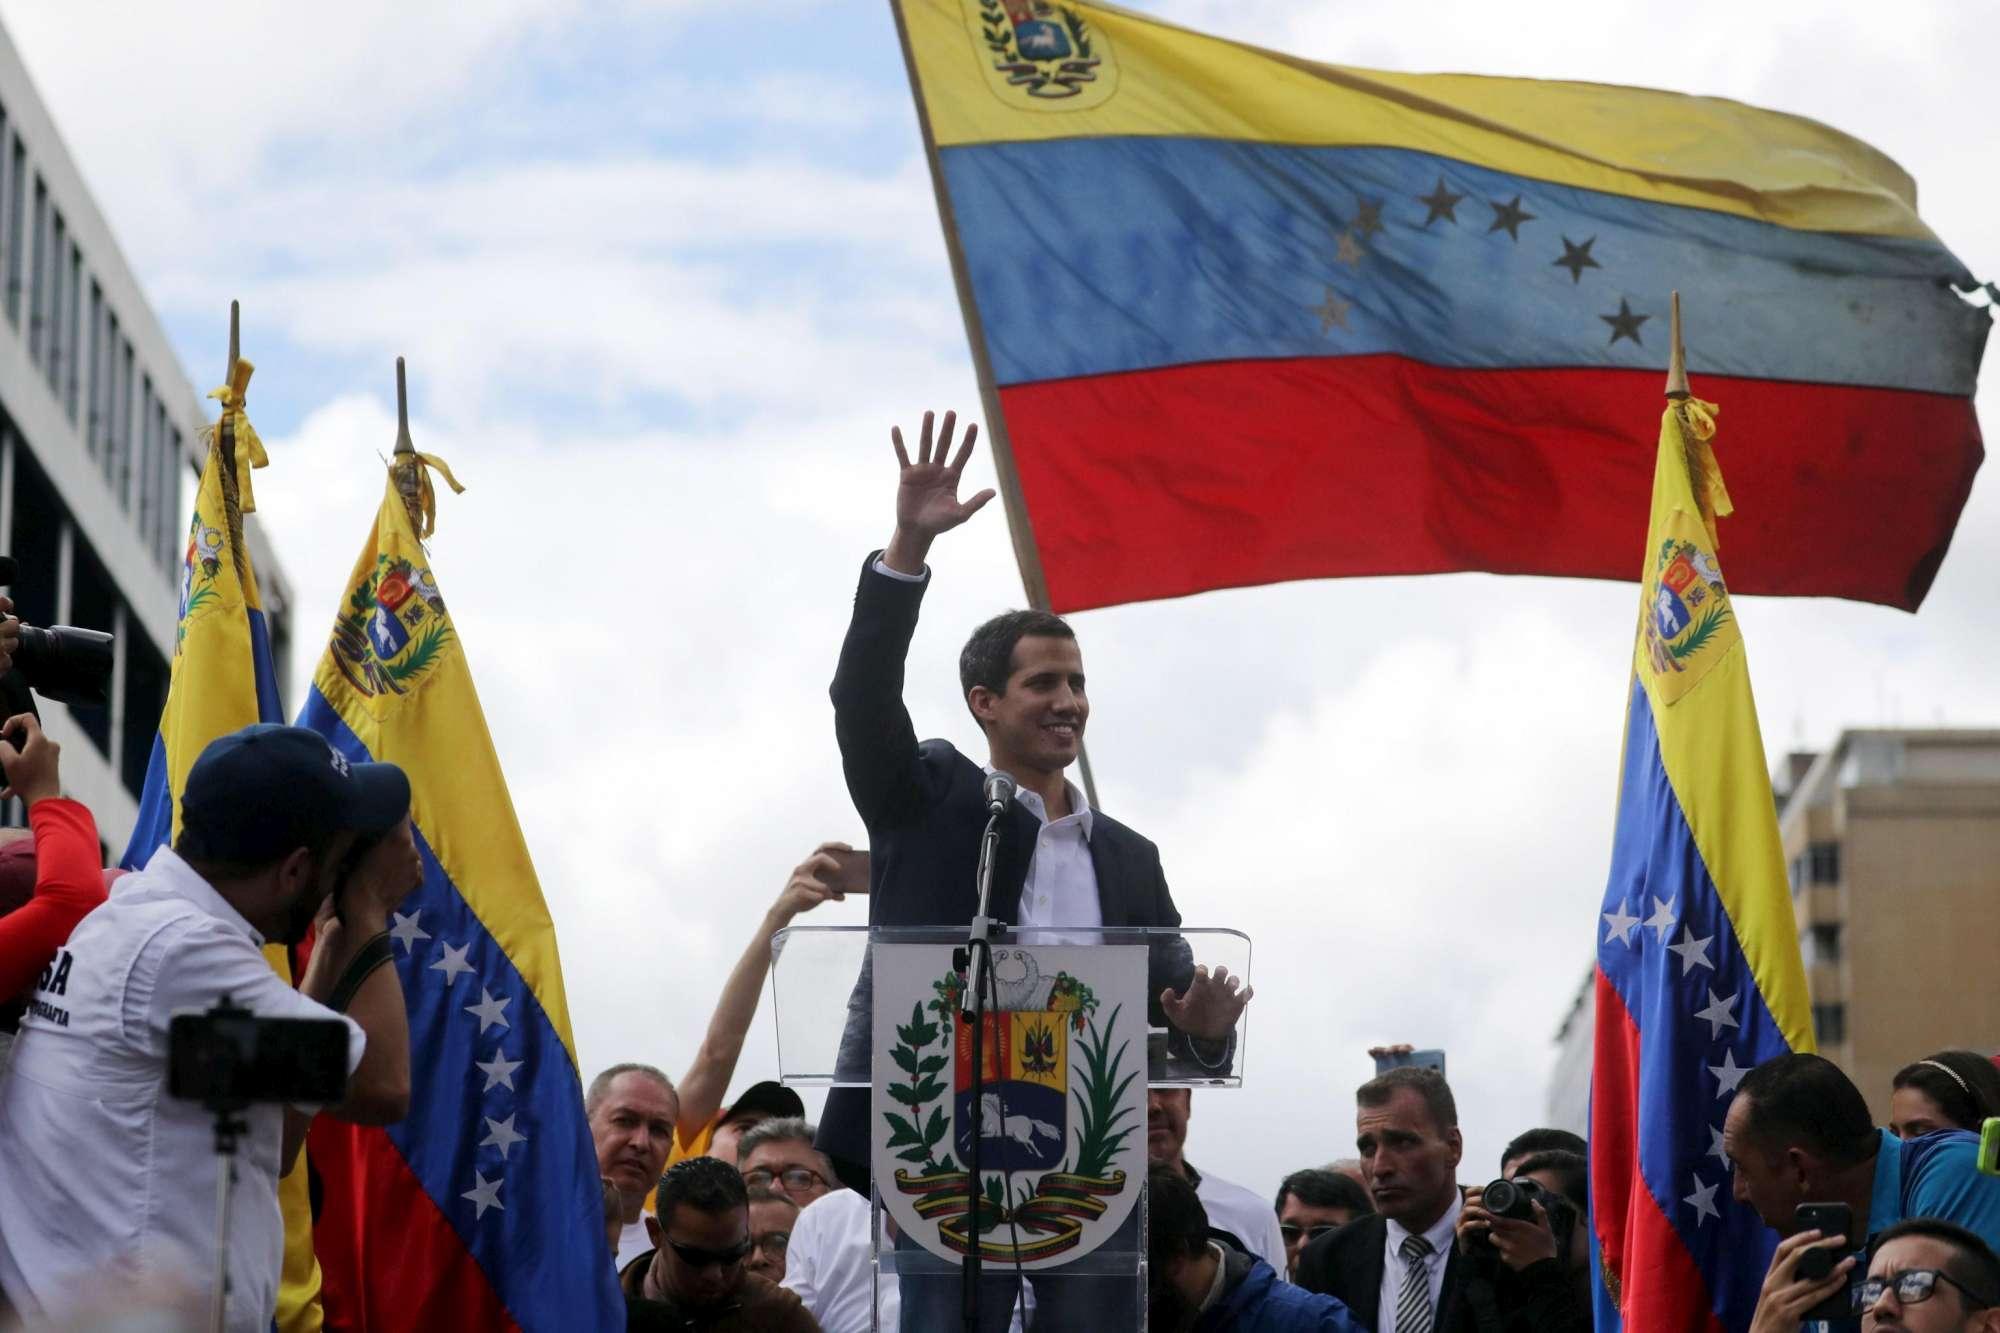 Venezuela, Guaidó si autoproclama presidente | Maduro: